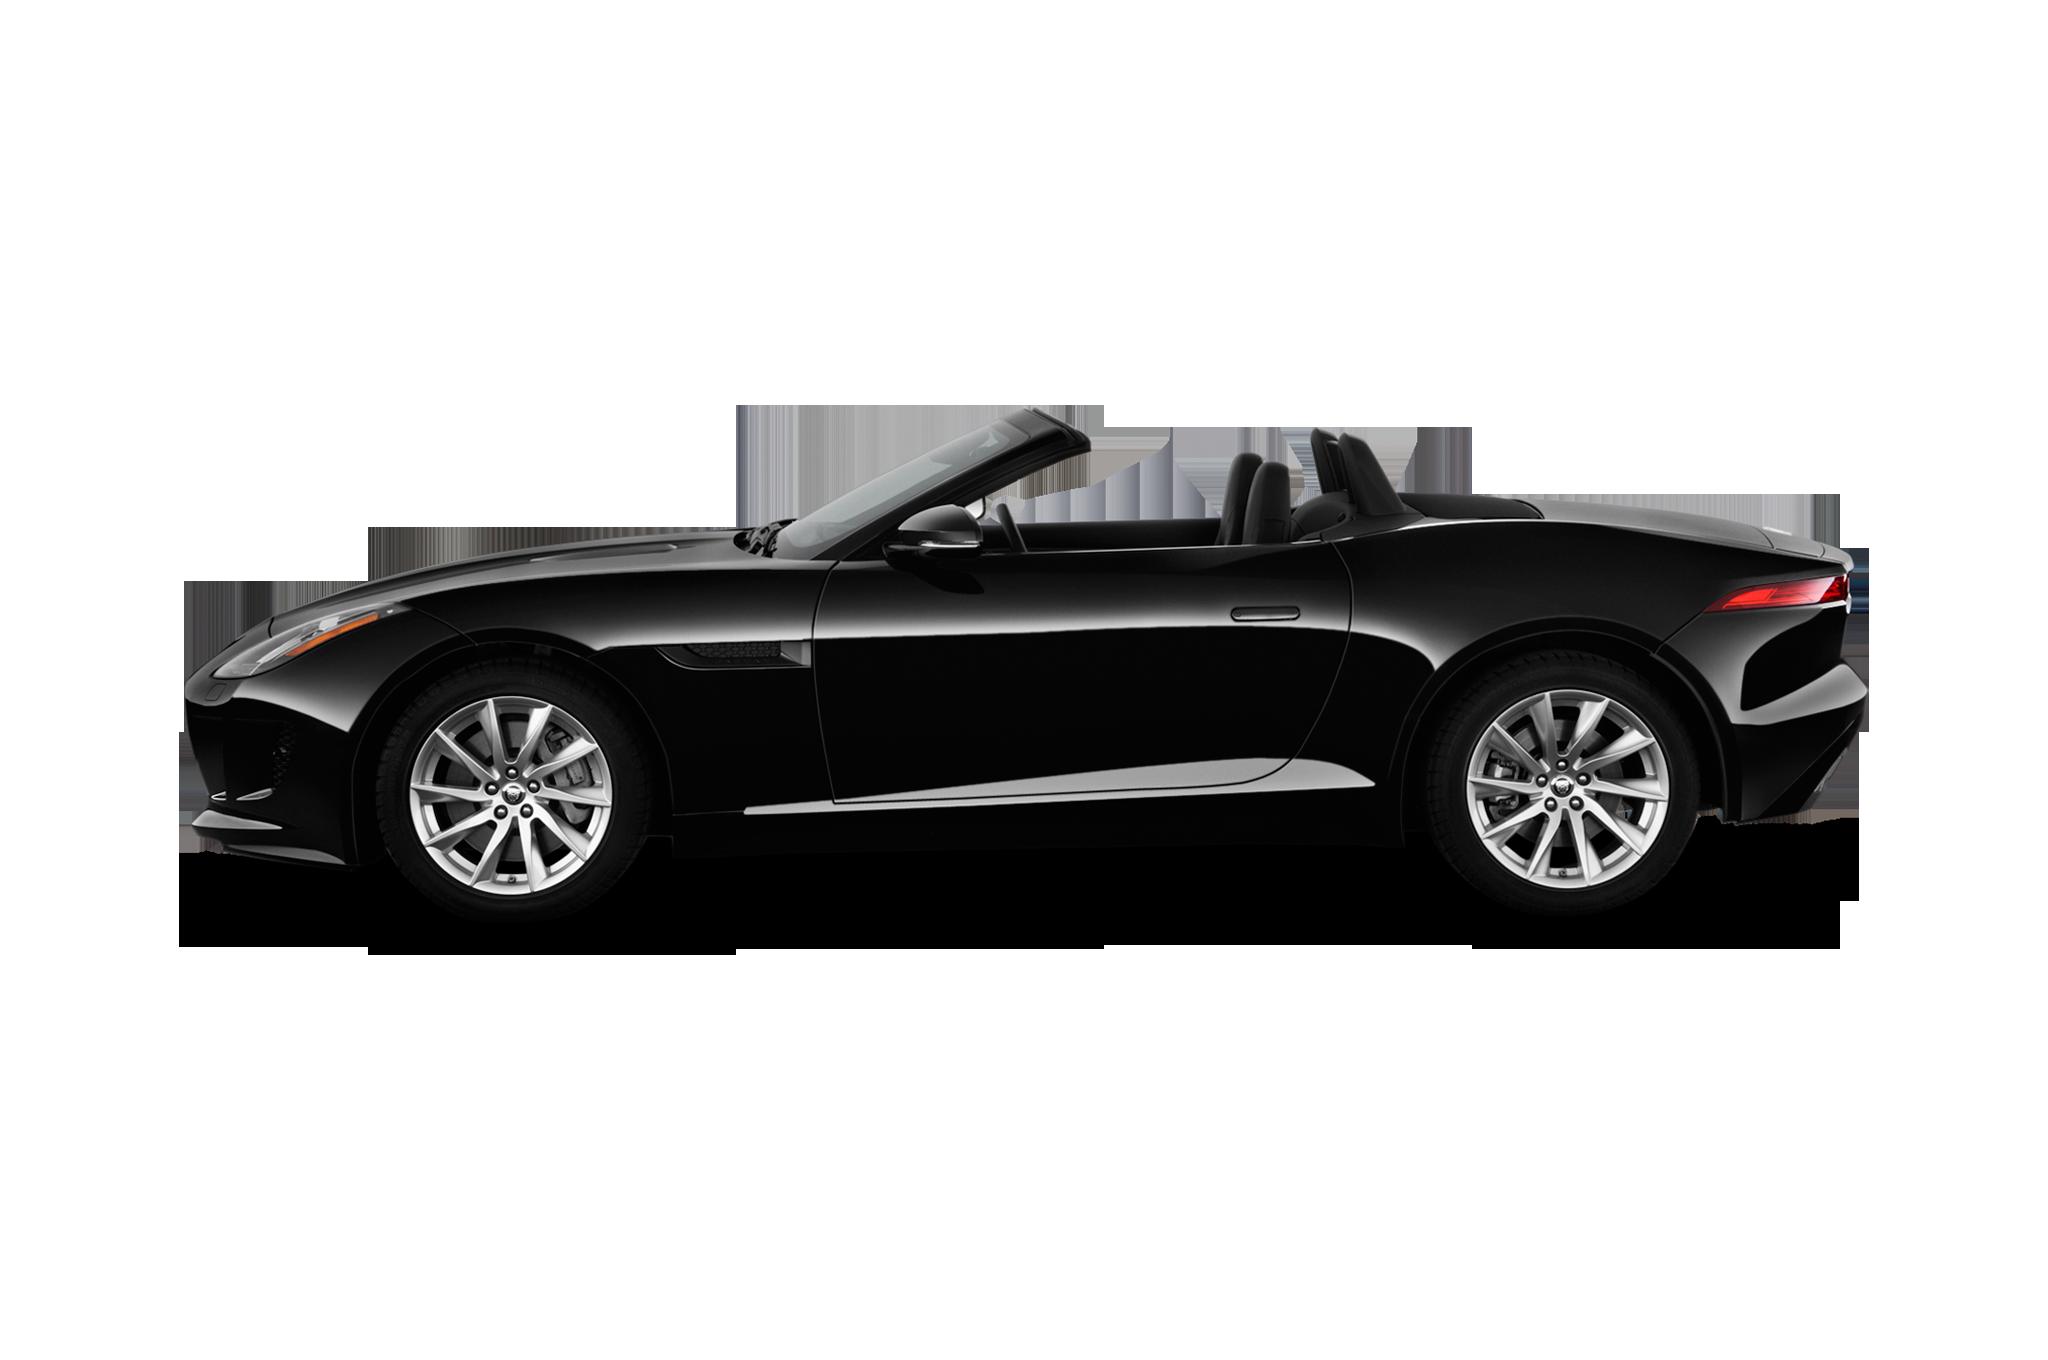 jaguar dynamic models model r car f sports type range convertible price